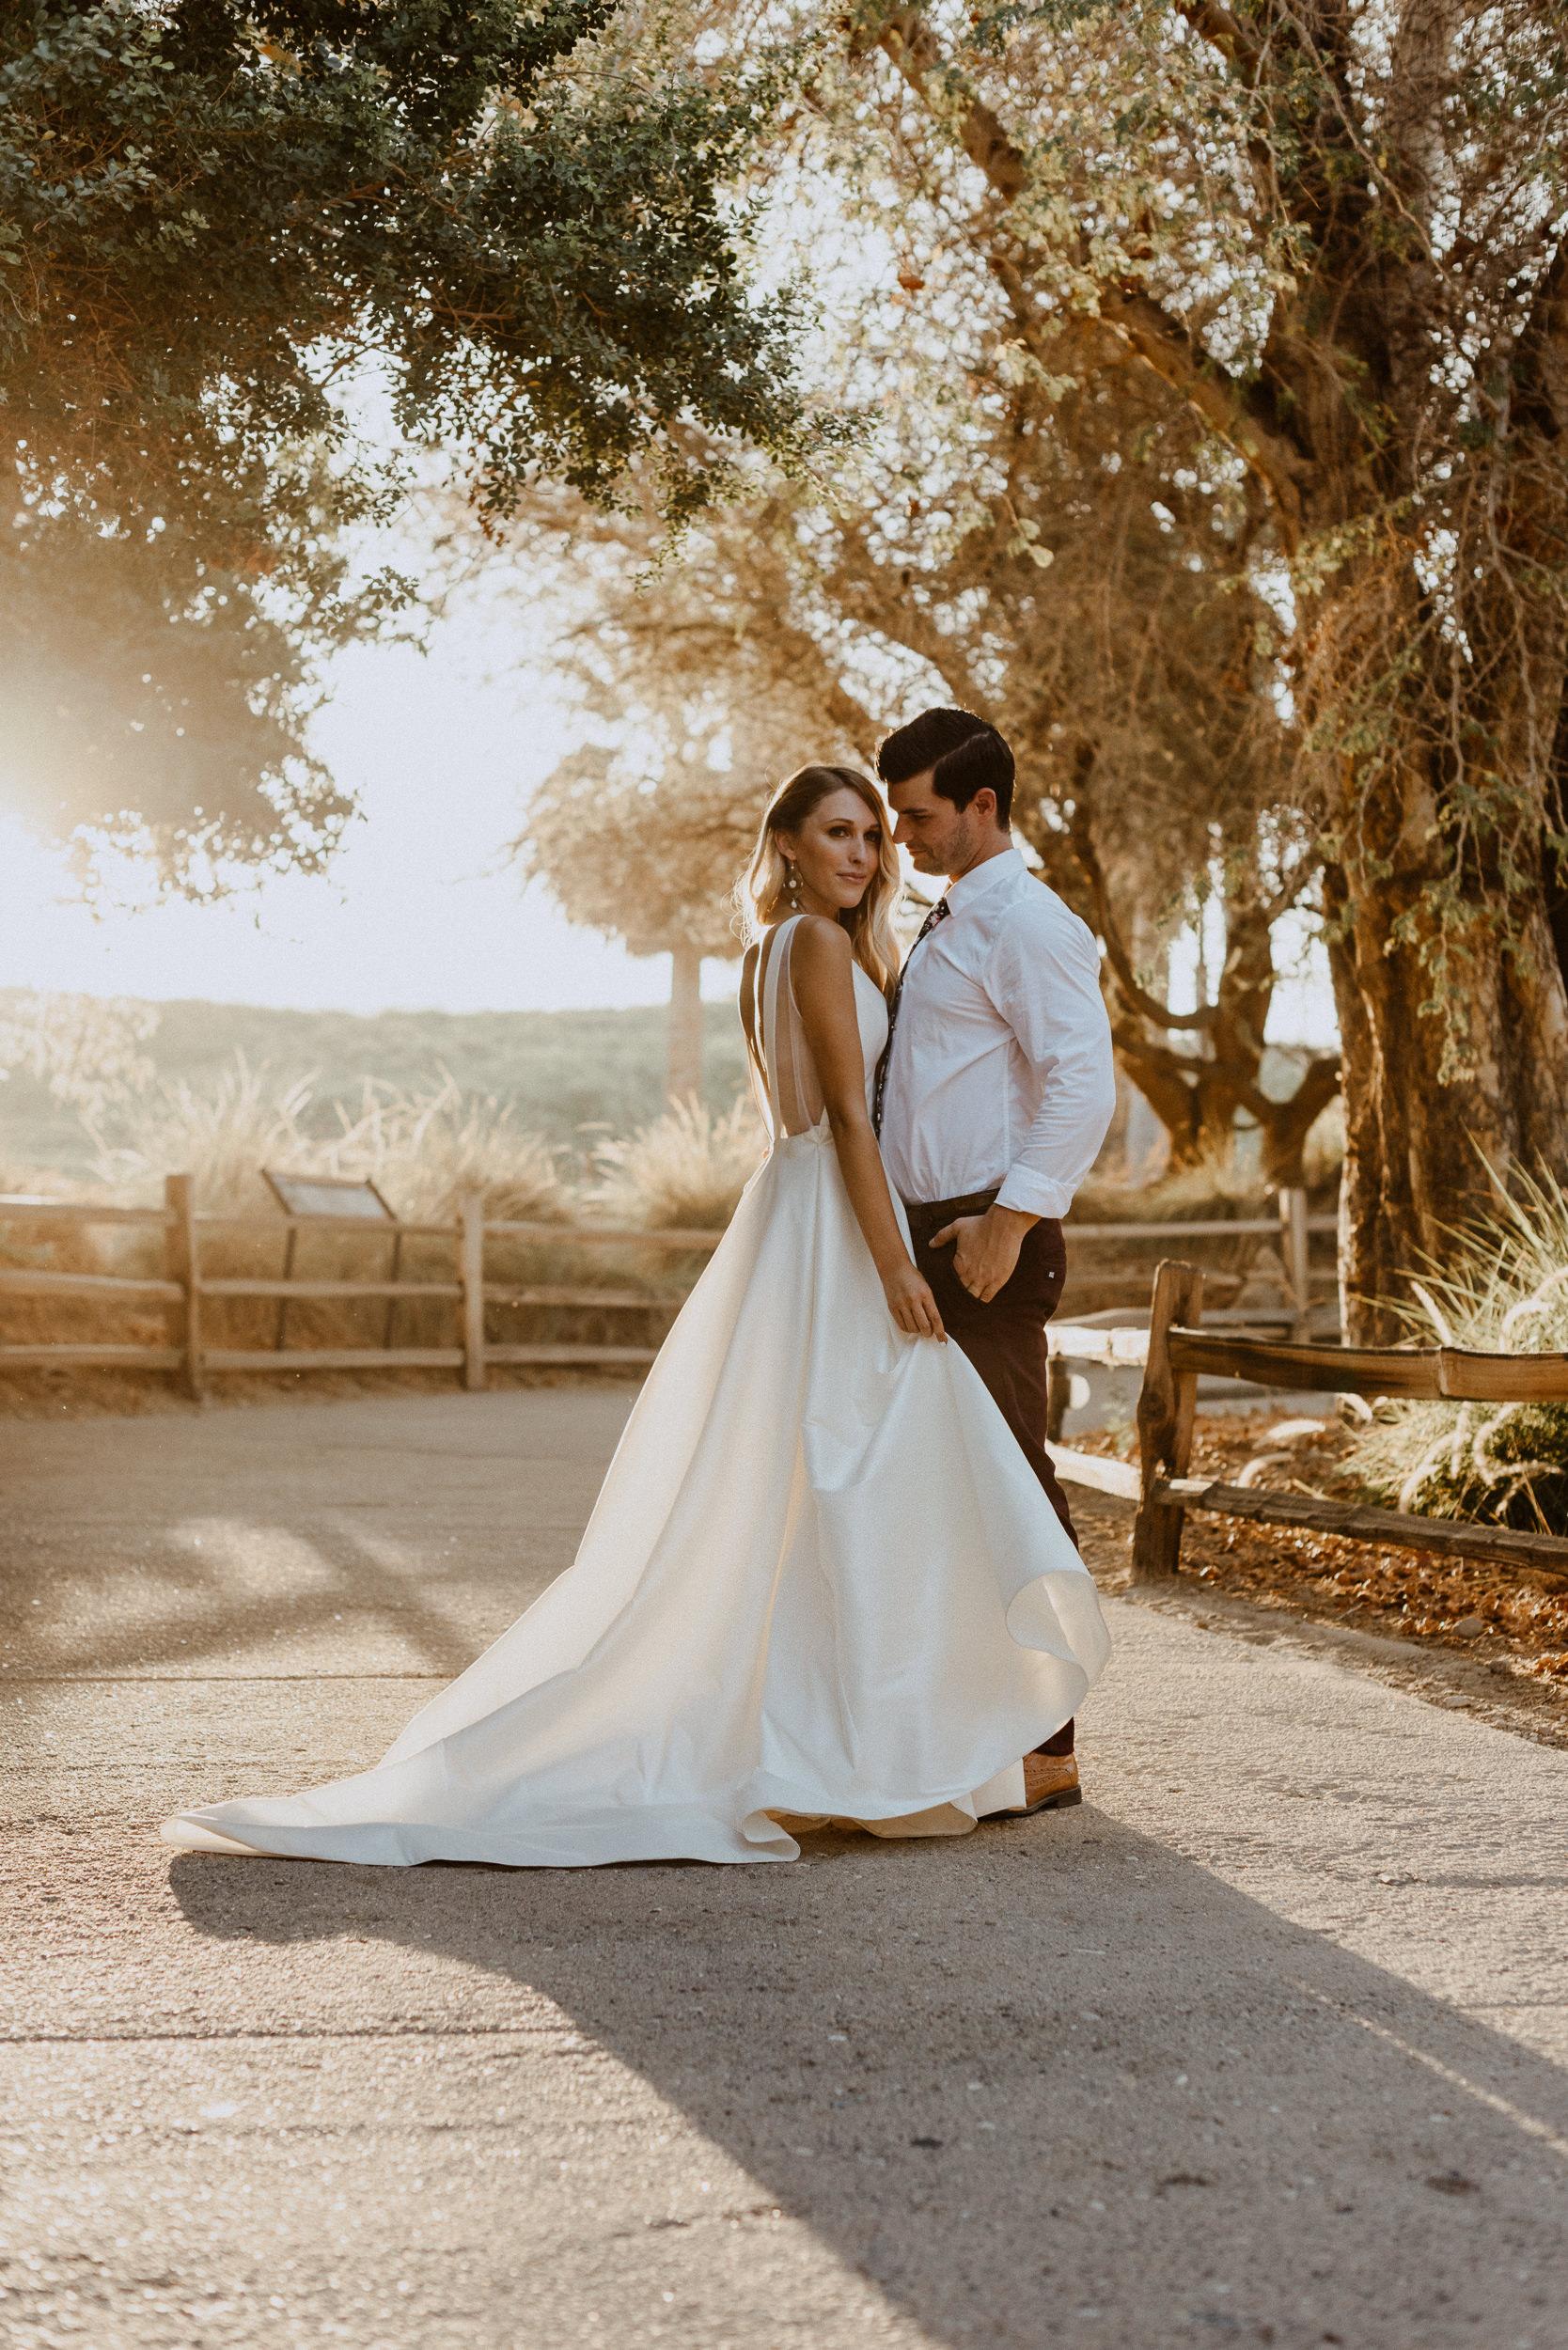 sChelsie + Chris - The Desert Shootout Wedding Romantics at The Living Desert-147.jpg